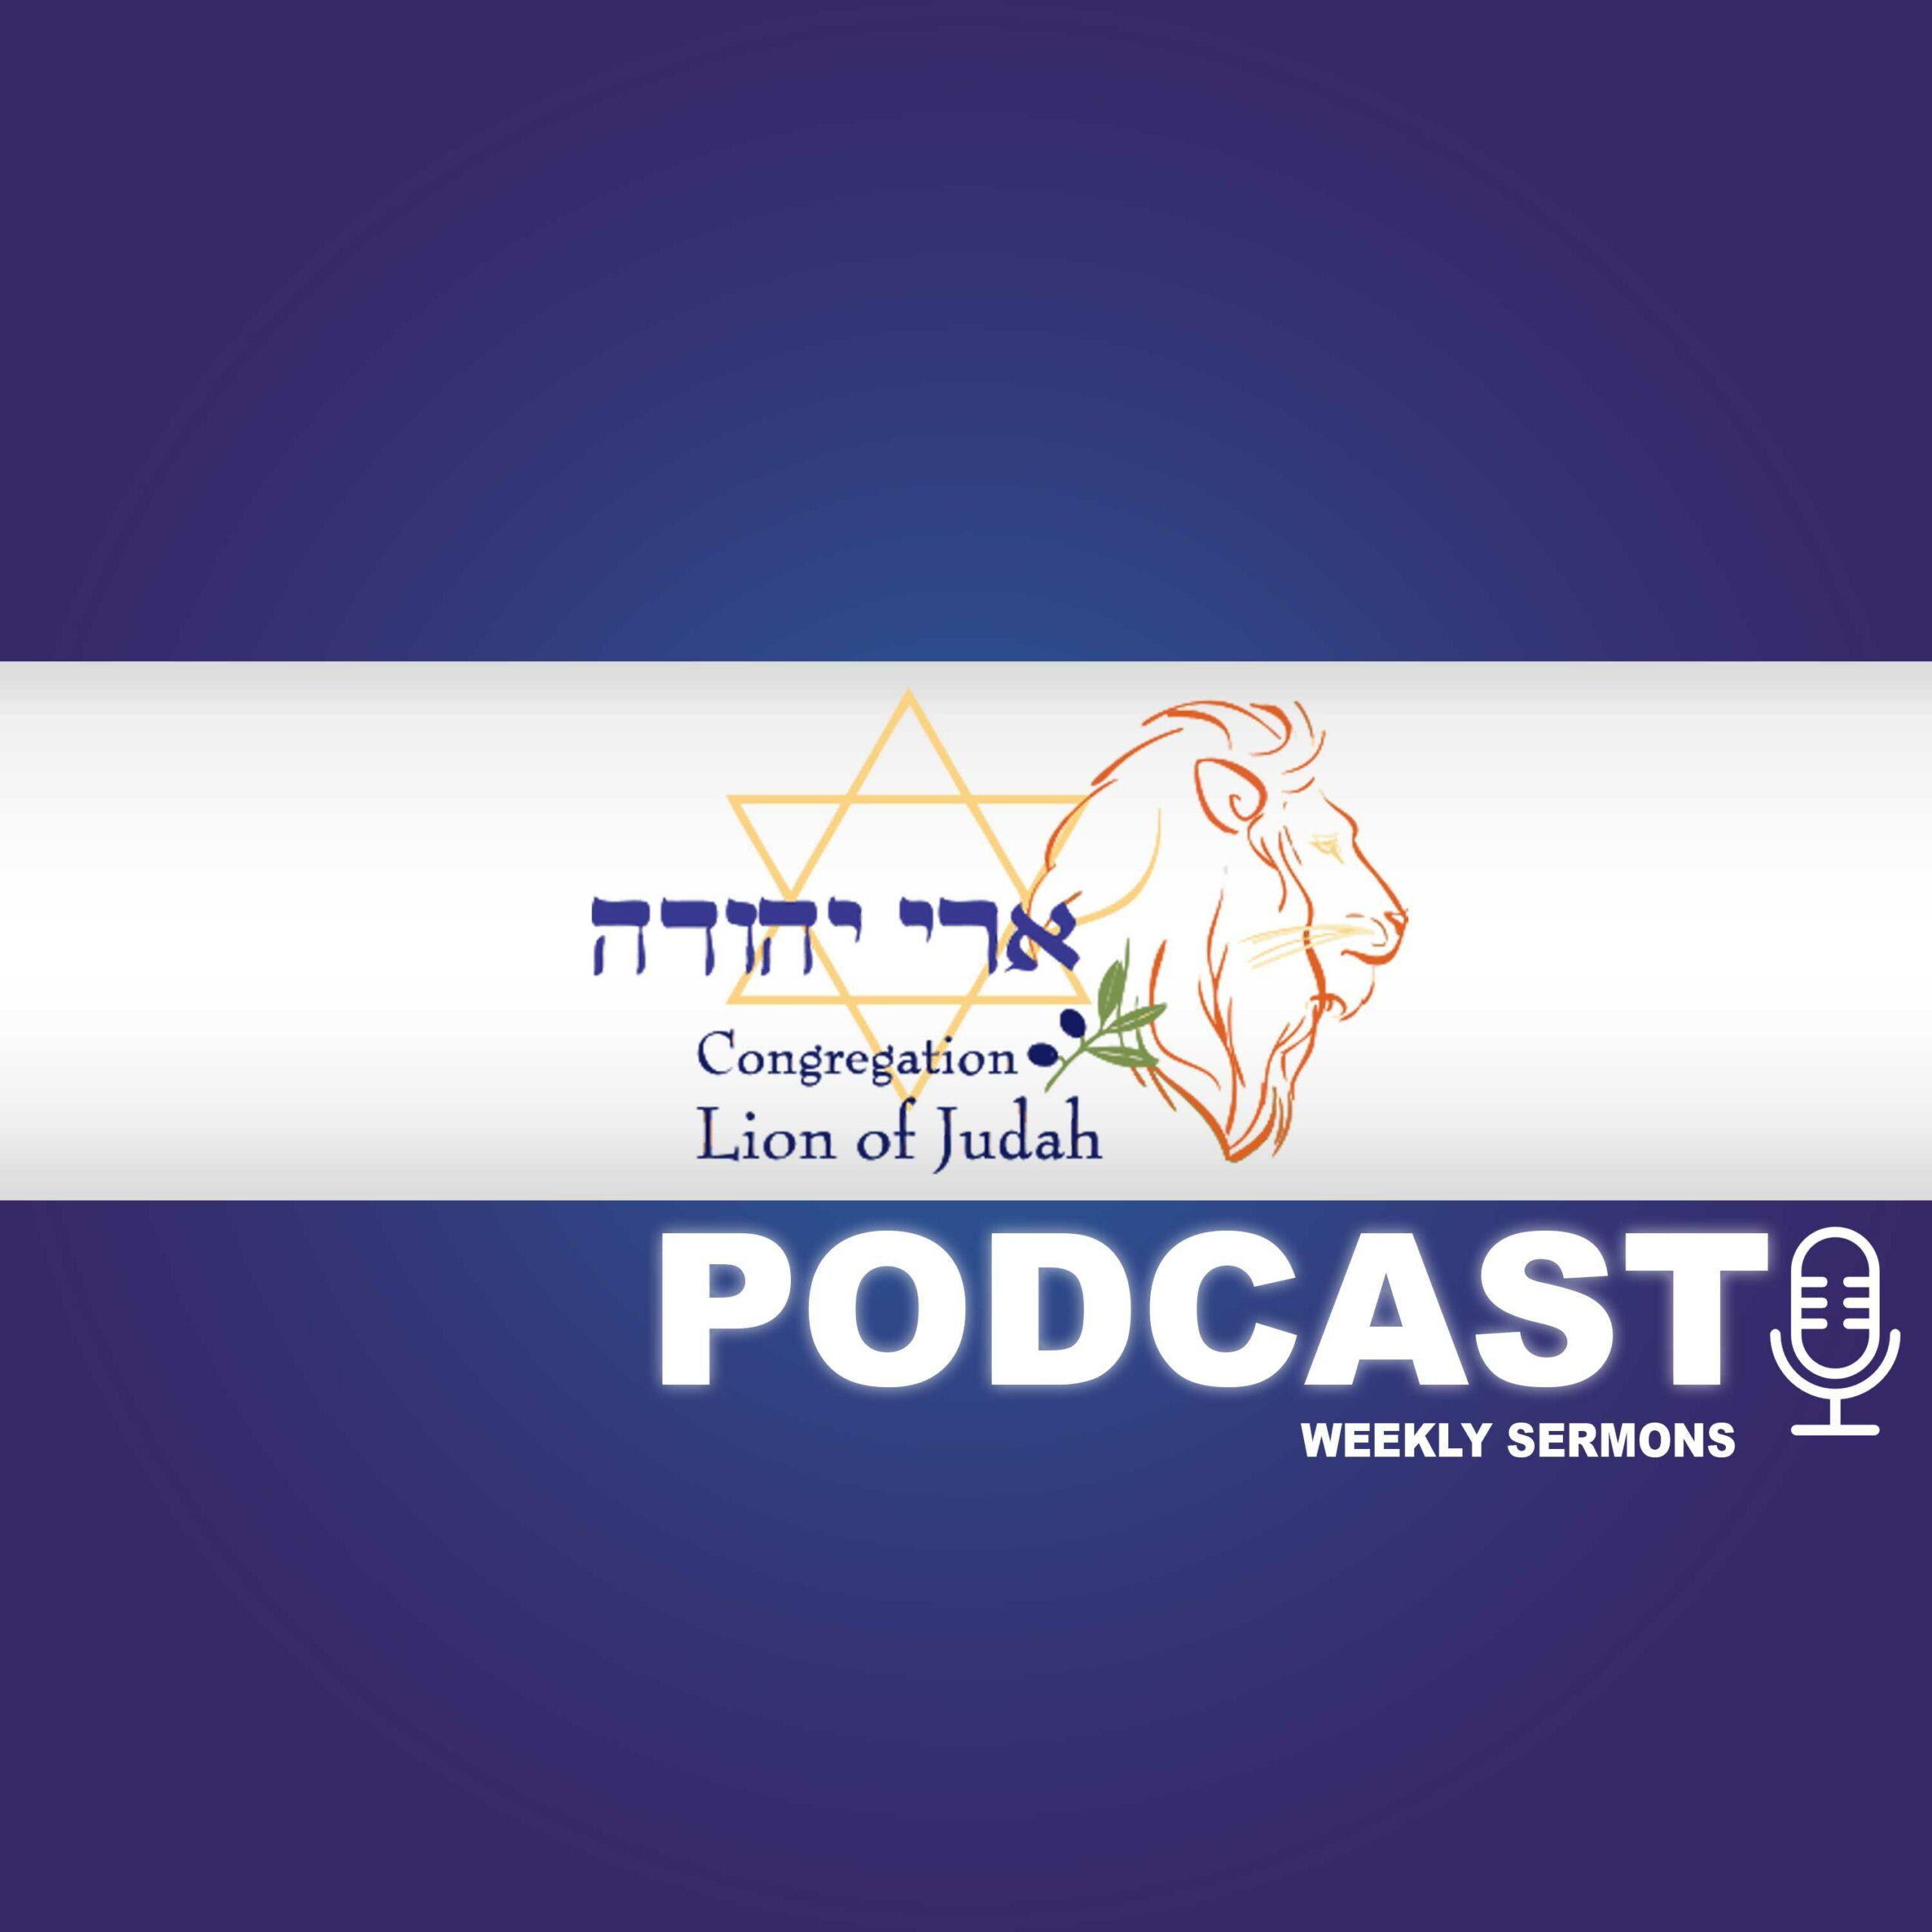 Messianic Congregation Lion of Judah